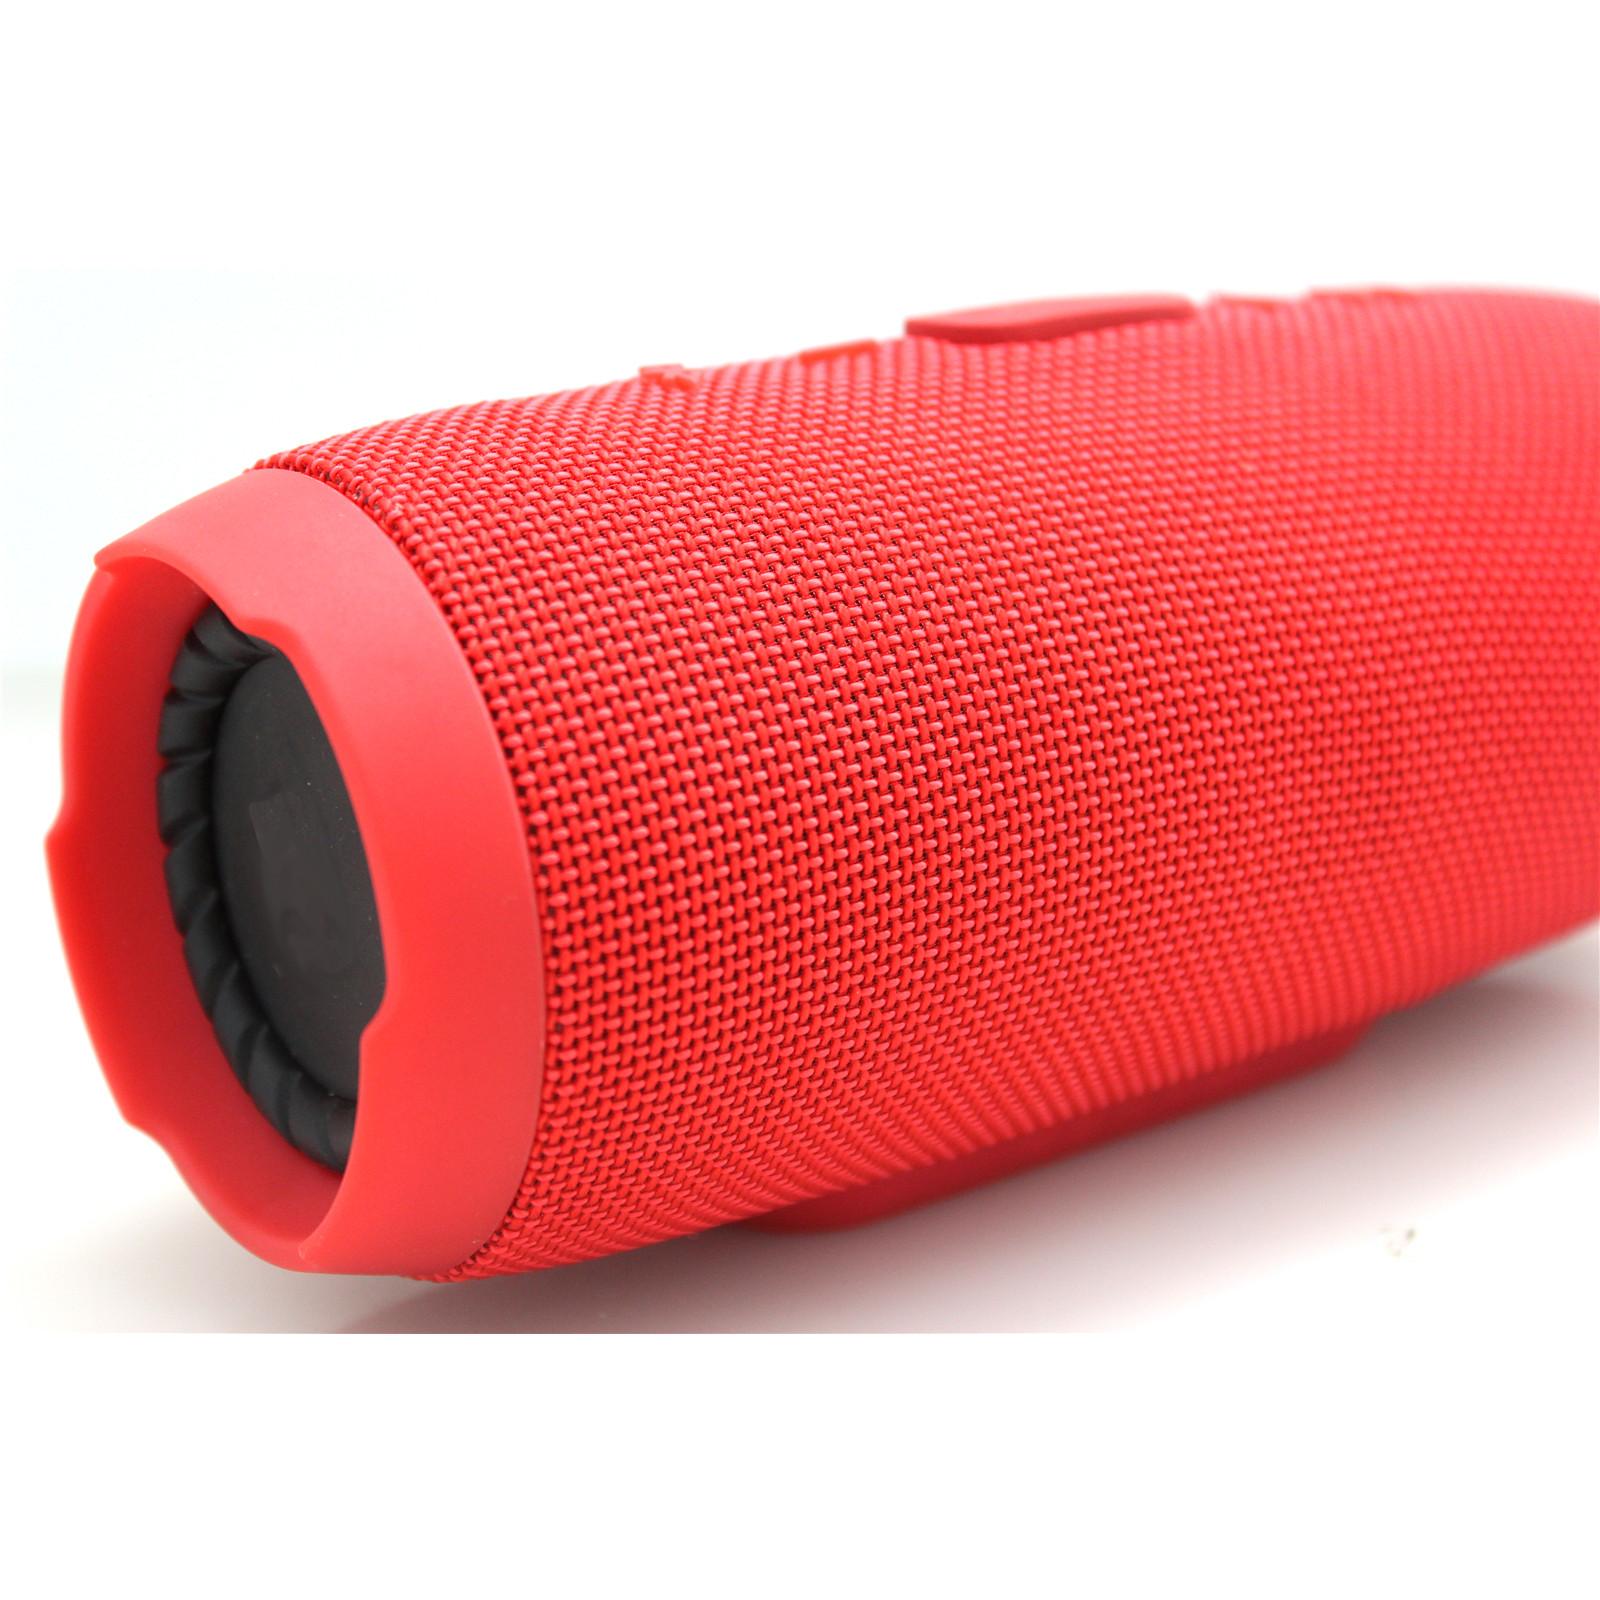 Buy the Artisan BLIZZARD Wireless Bluetooth Speaker - RED